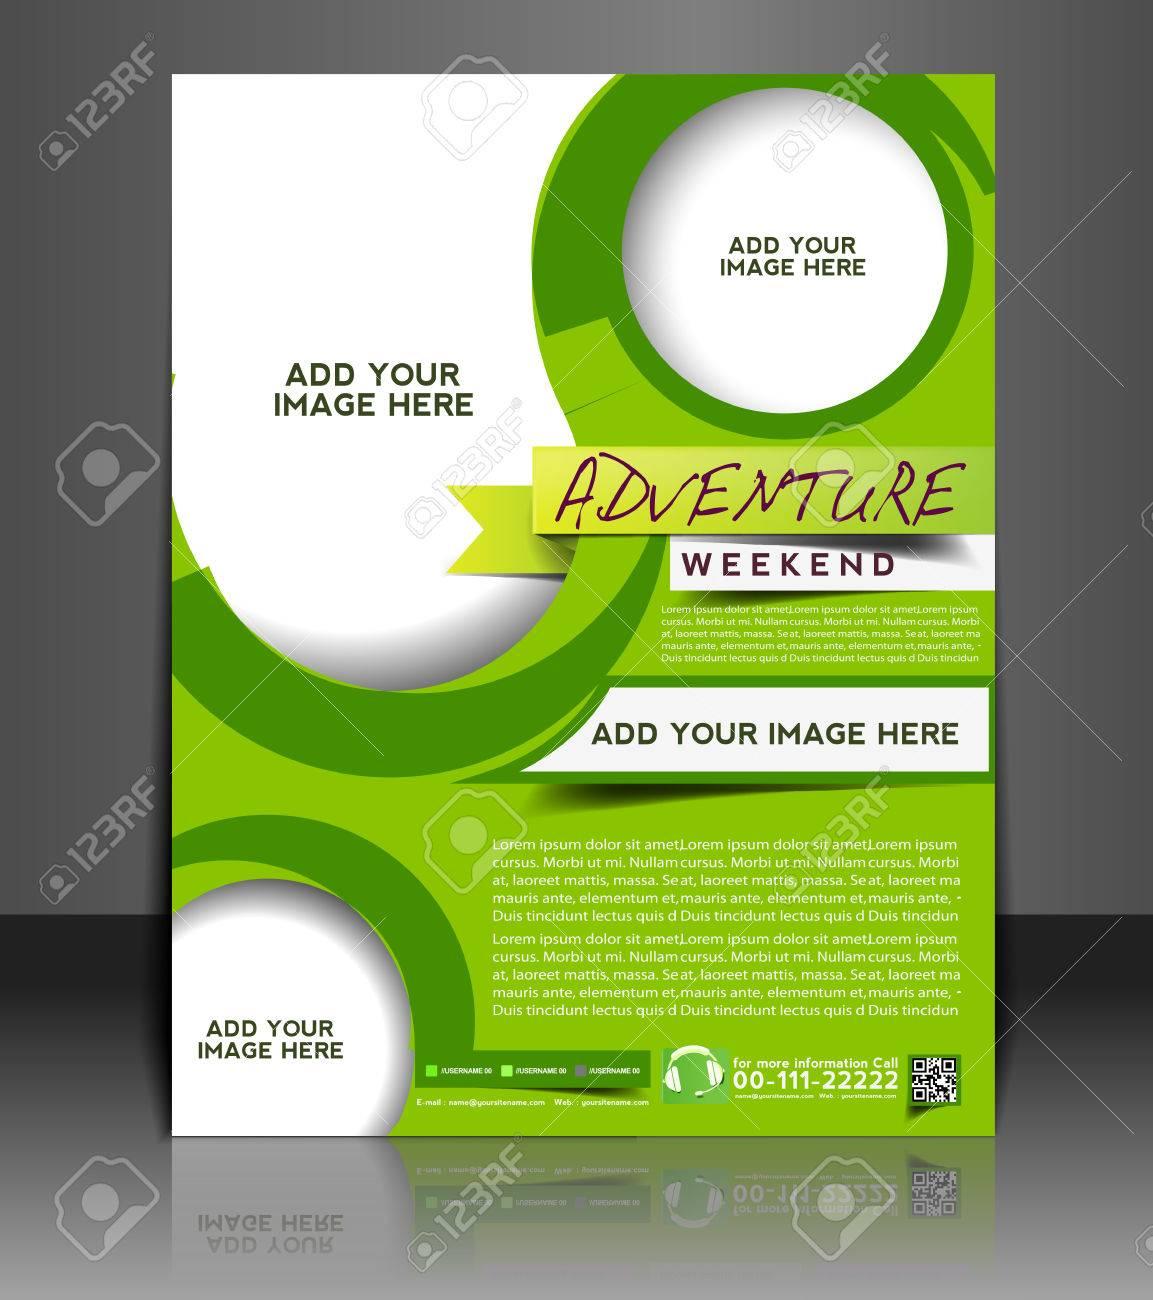 Adventurer Flyer & Poster Template Design Stock Vector - 26704177